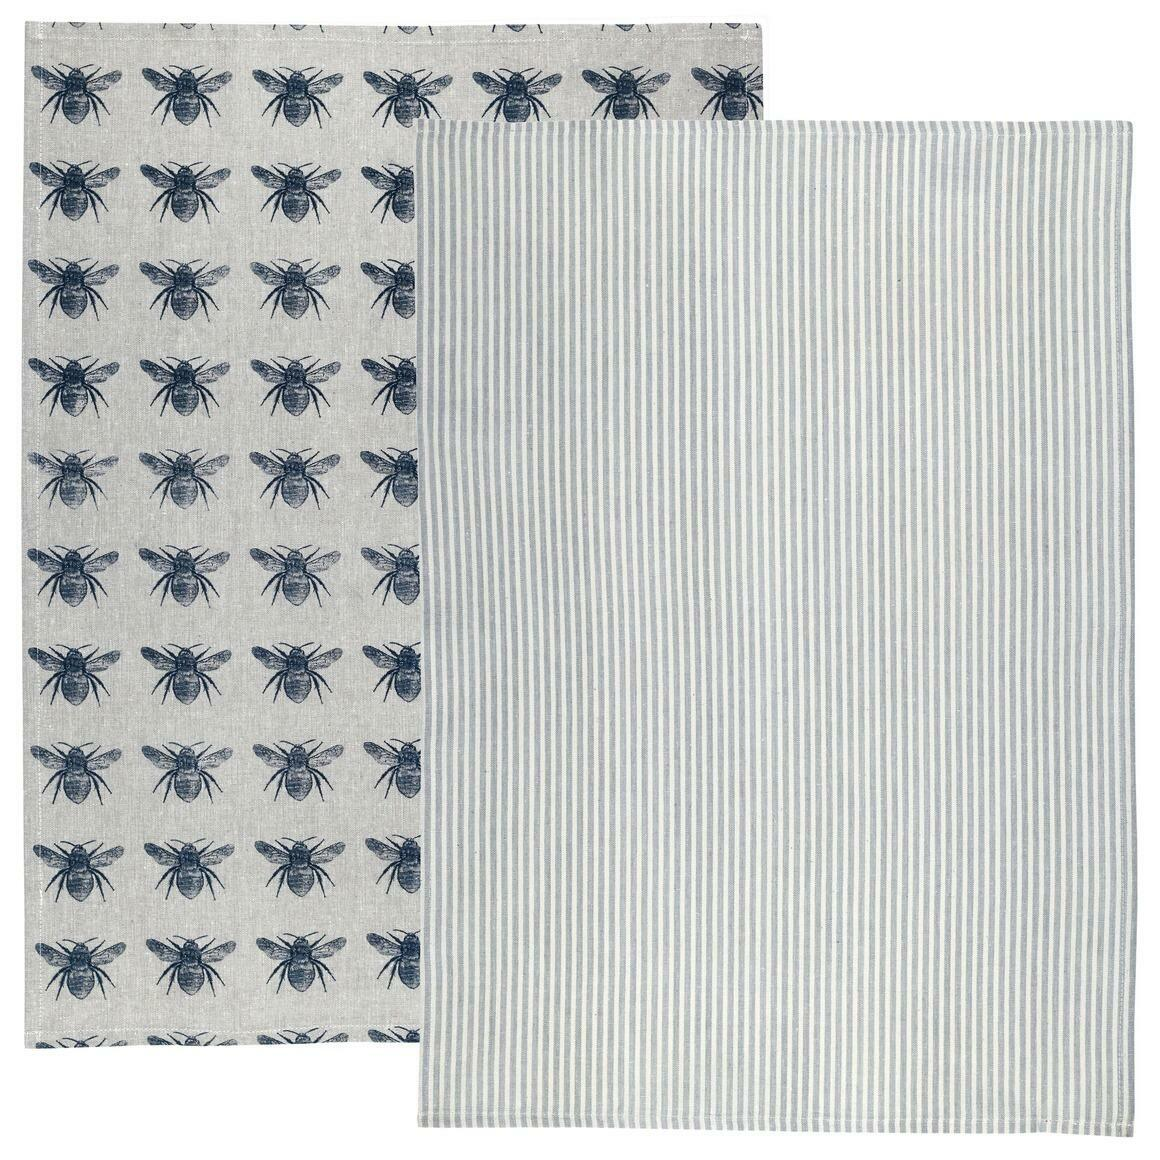 Prussian Blue Honey Bee Tea Towel Pack | Trada Marketplace